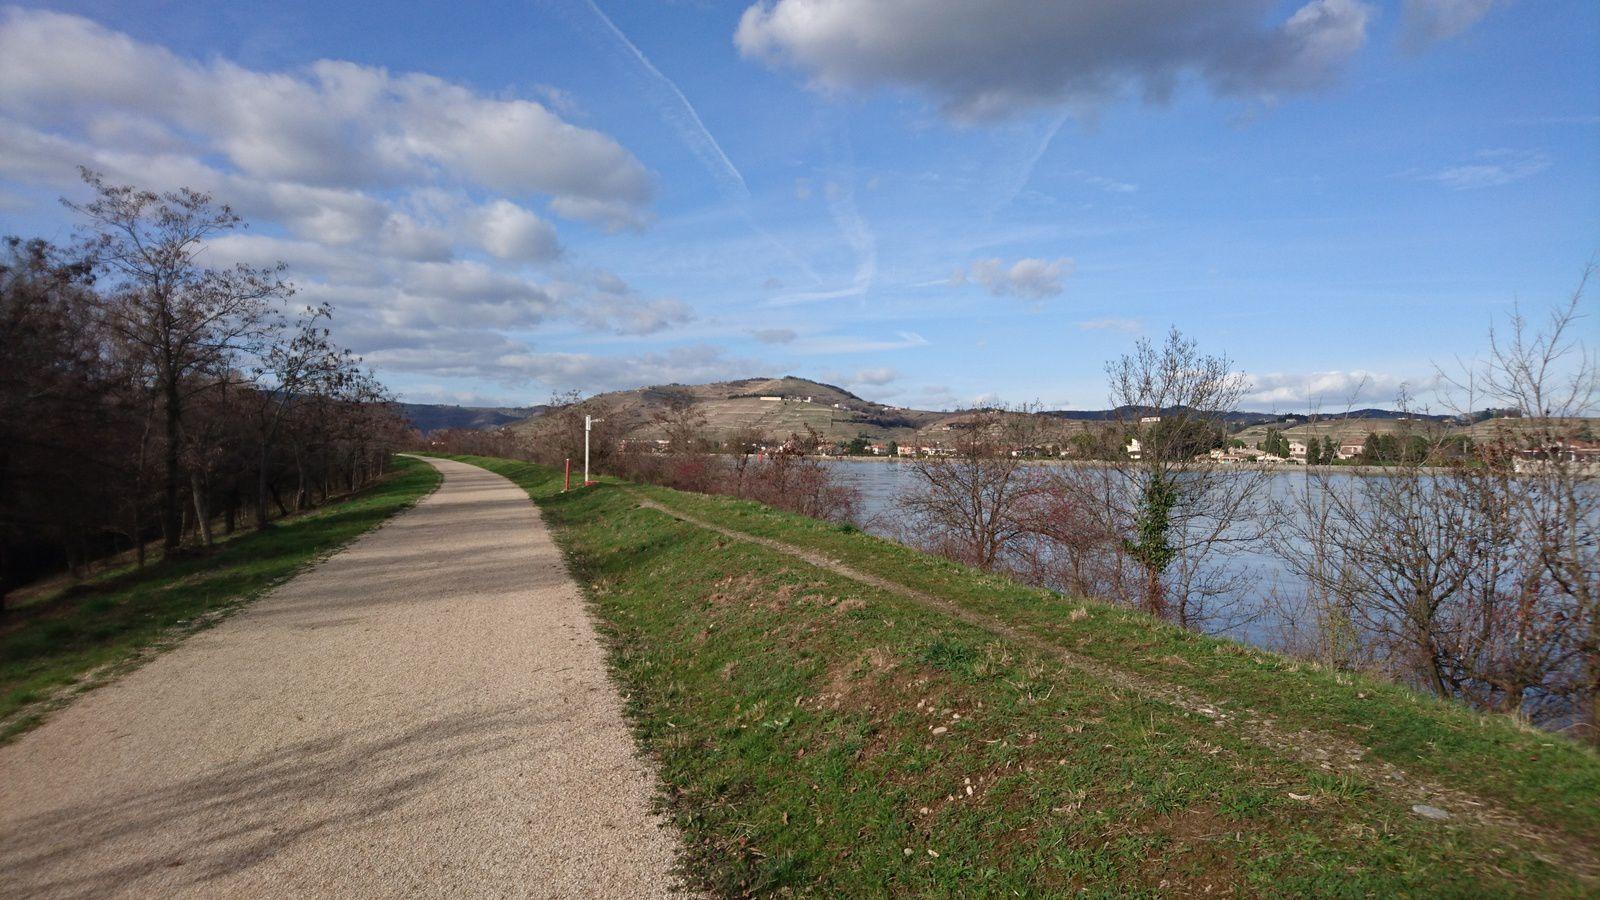 Viarhôna entre Tournon et Glun